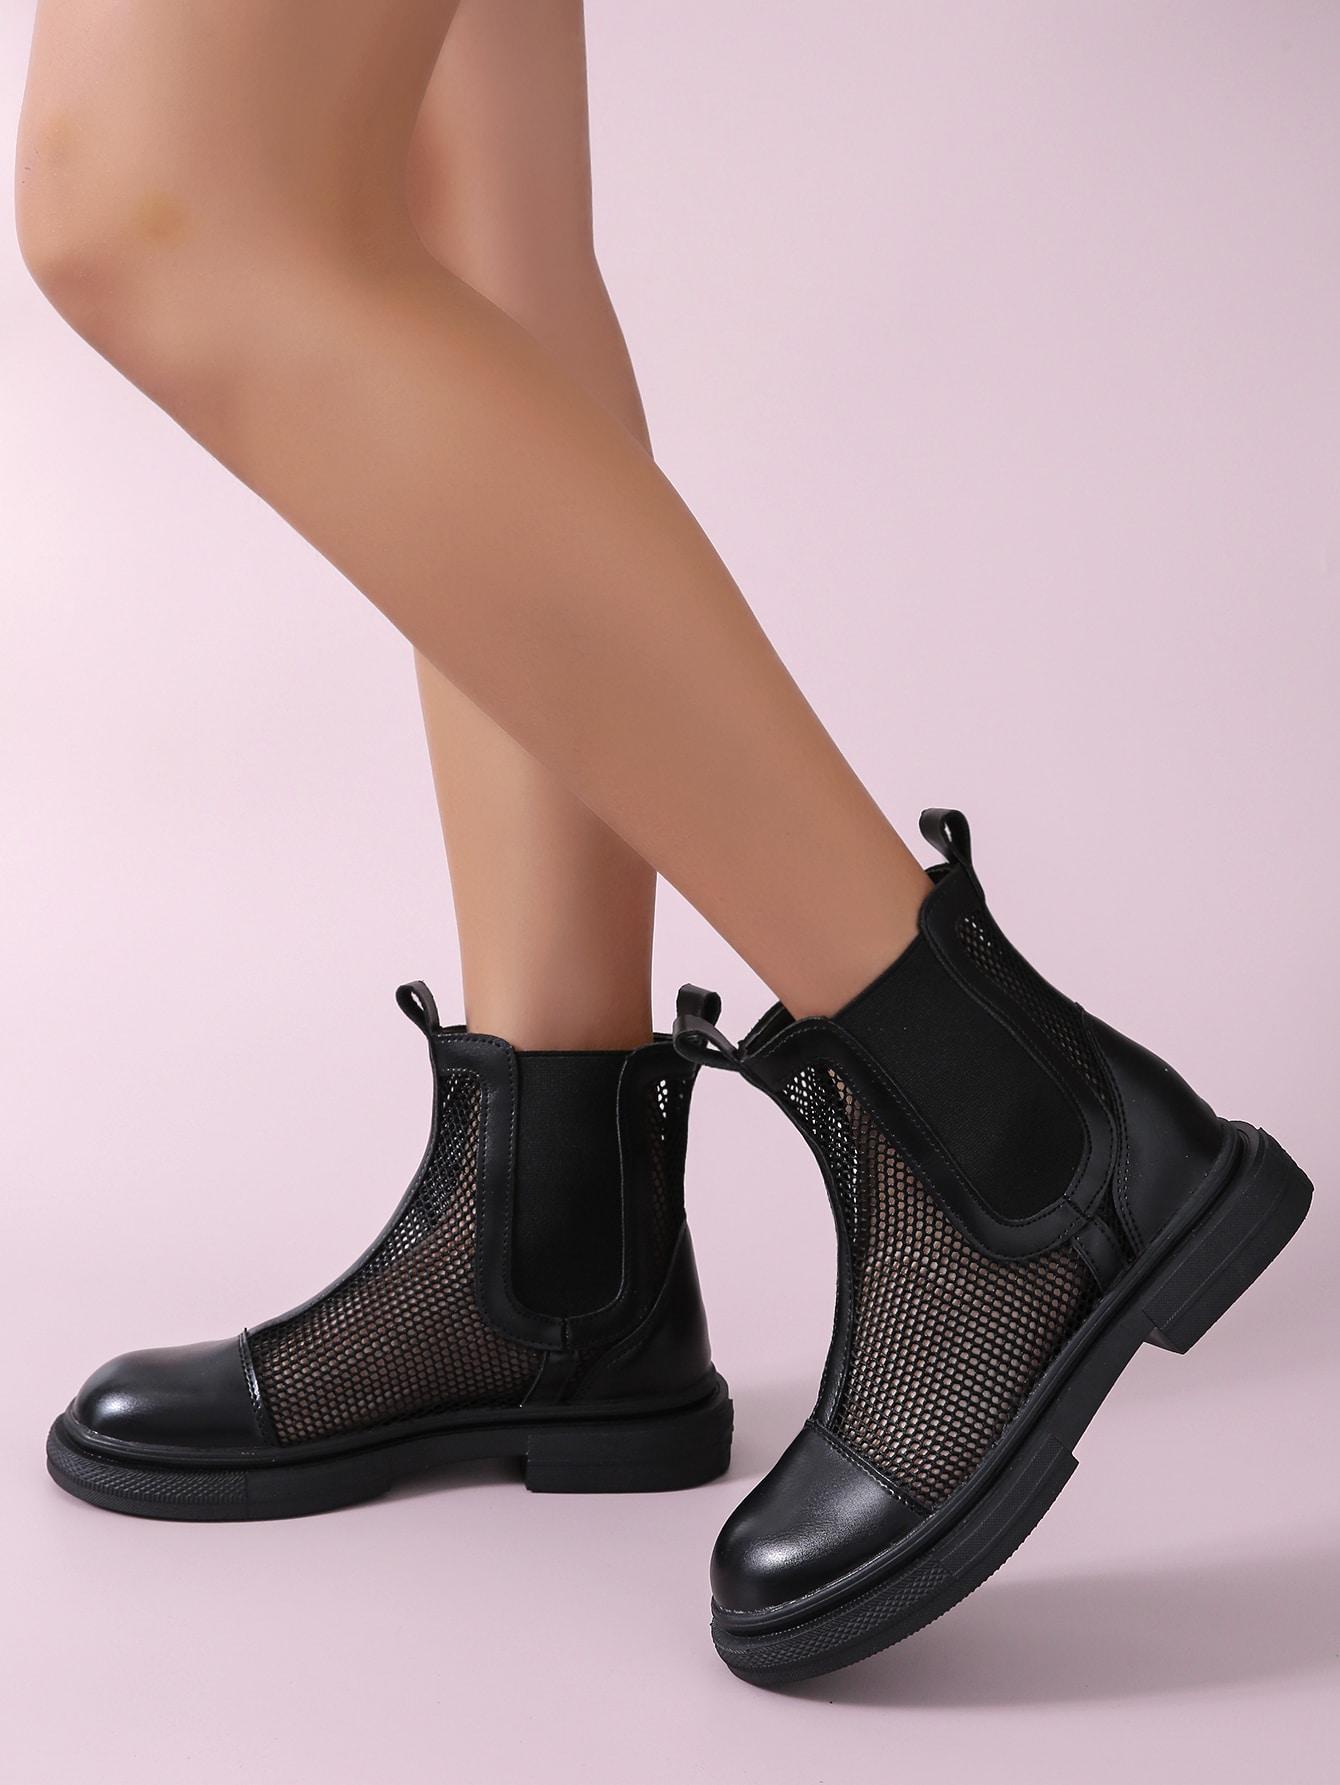 Minimalist Mesh Panel Ankle Boots